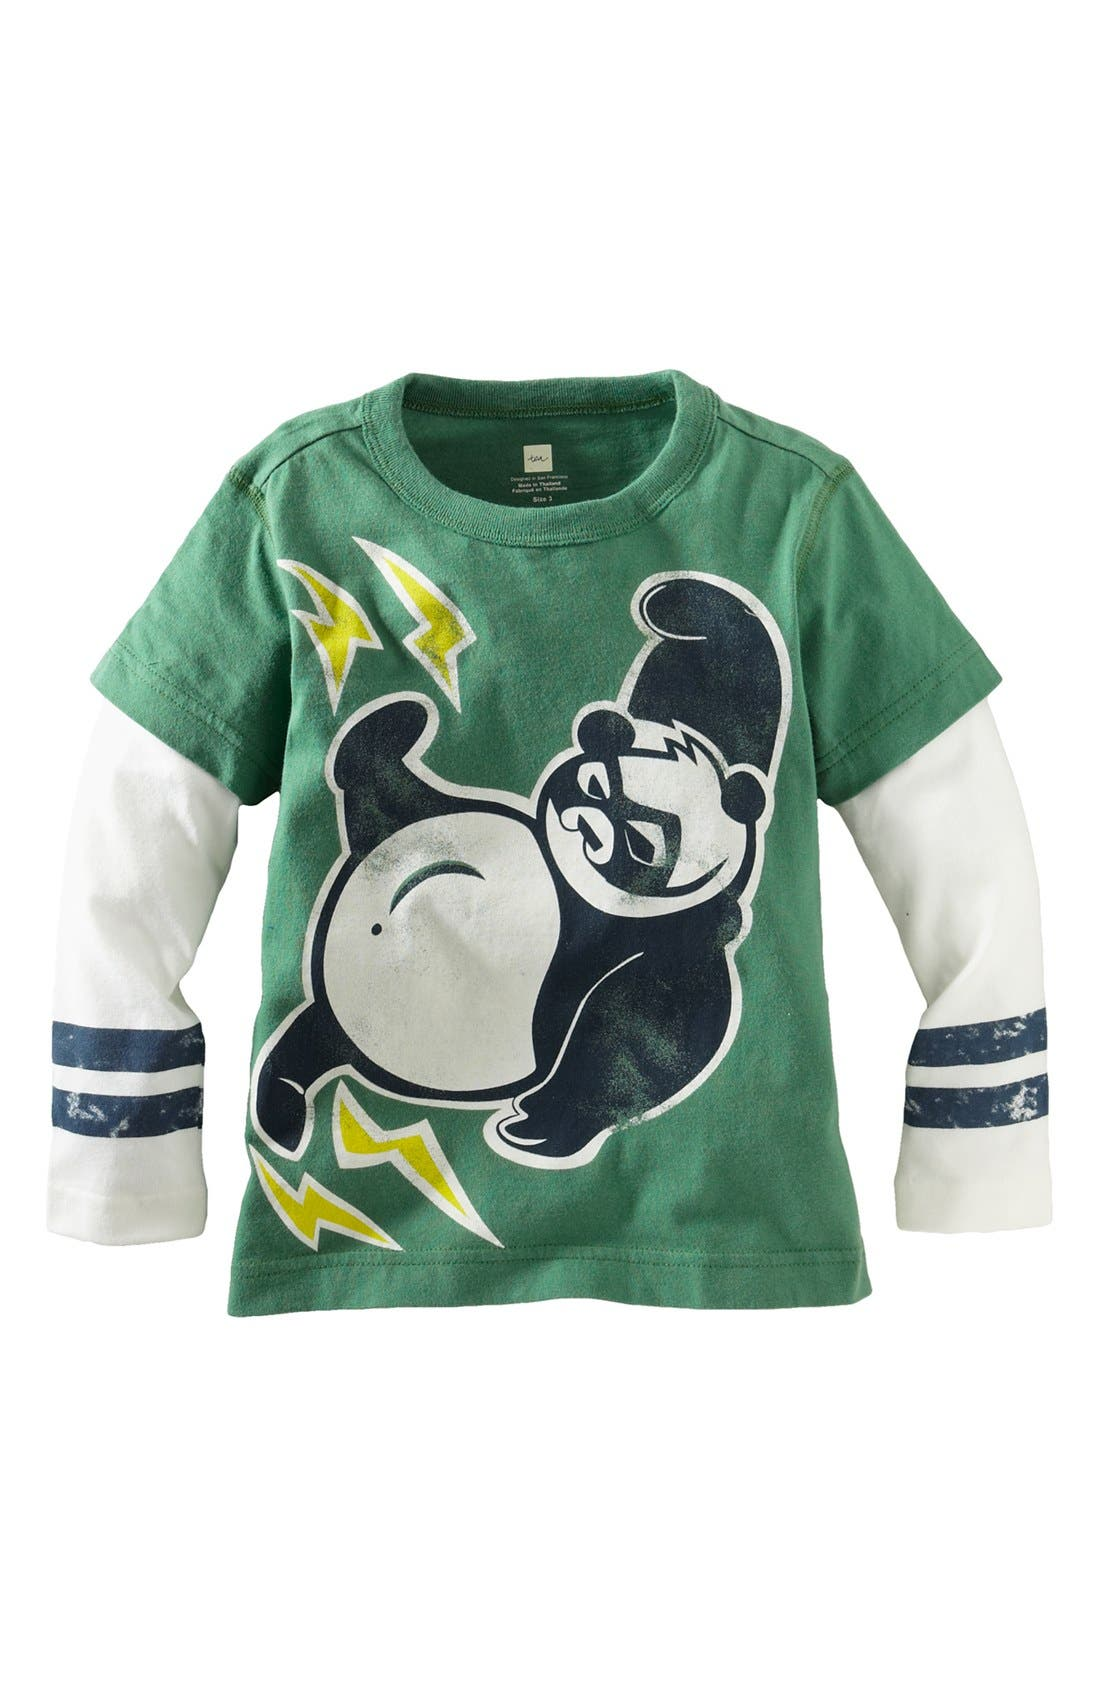 Main Image - Tea Collection 'Super Panda Double Decker' T-Shirt (Toddler Boys)